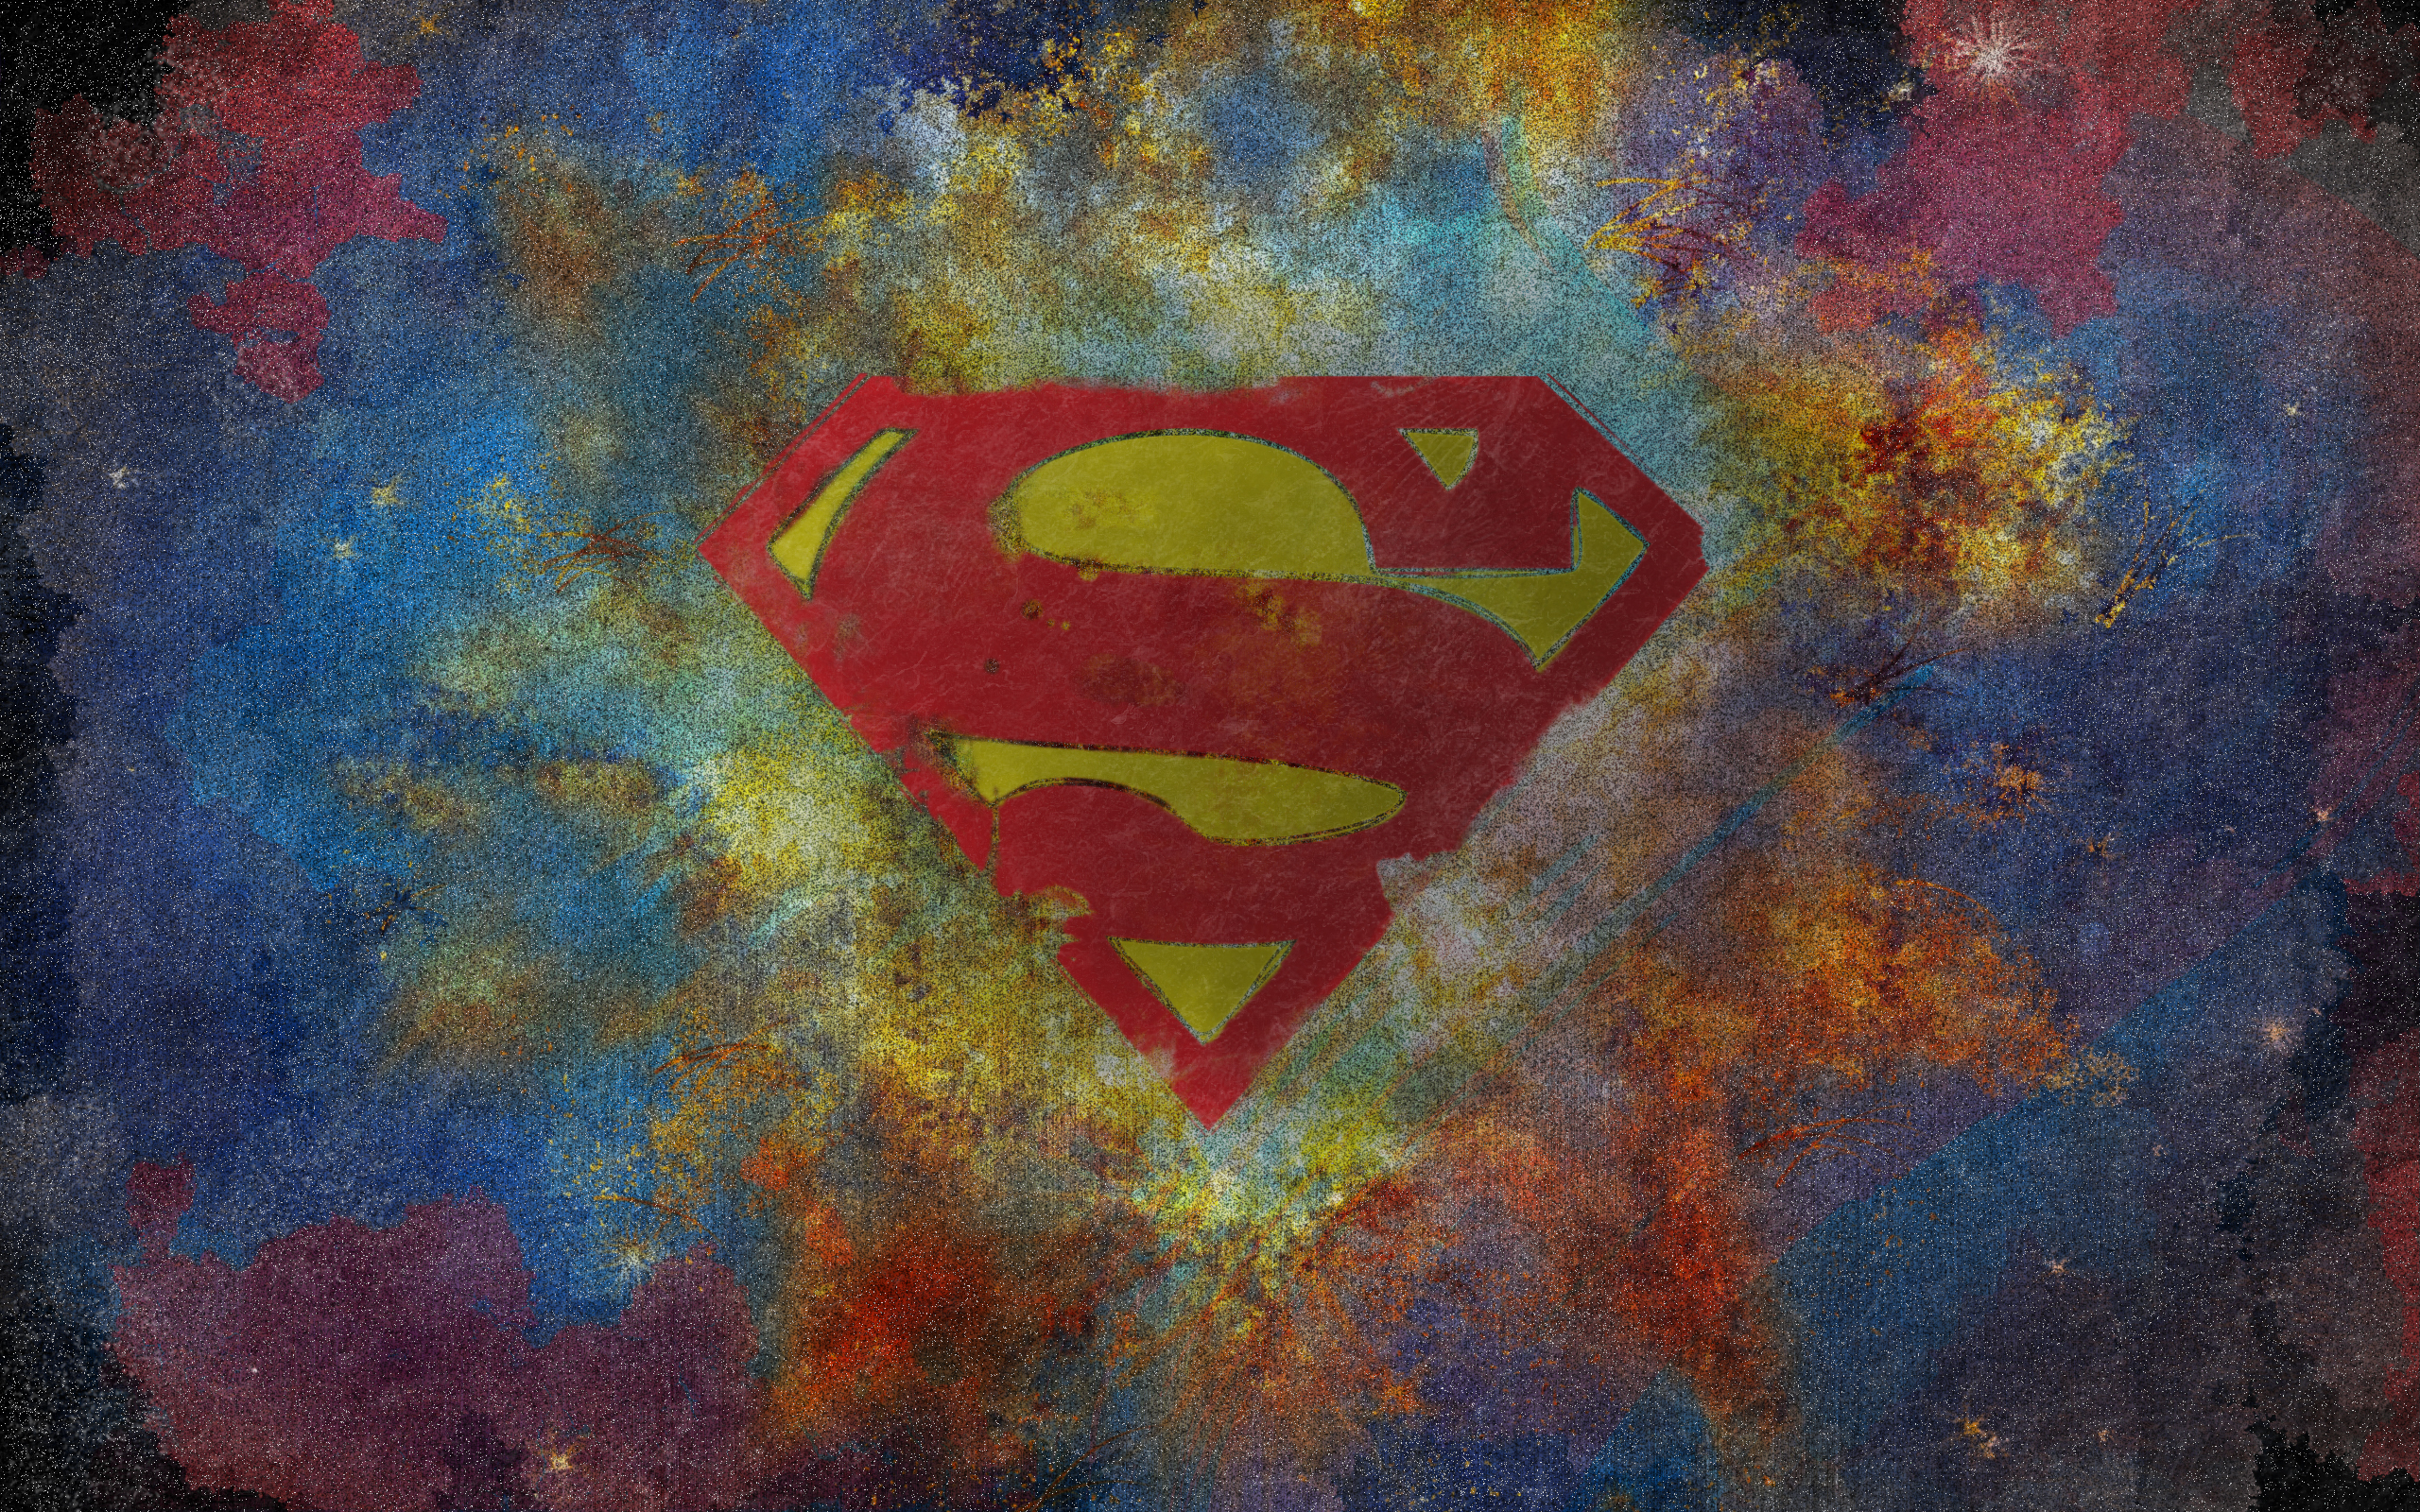 Superman Wallpaper by kenbcurry on DeviantArt